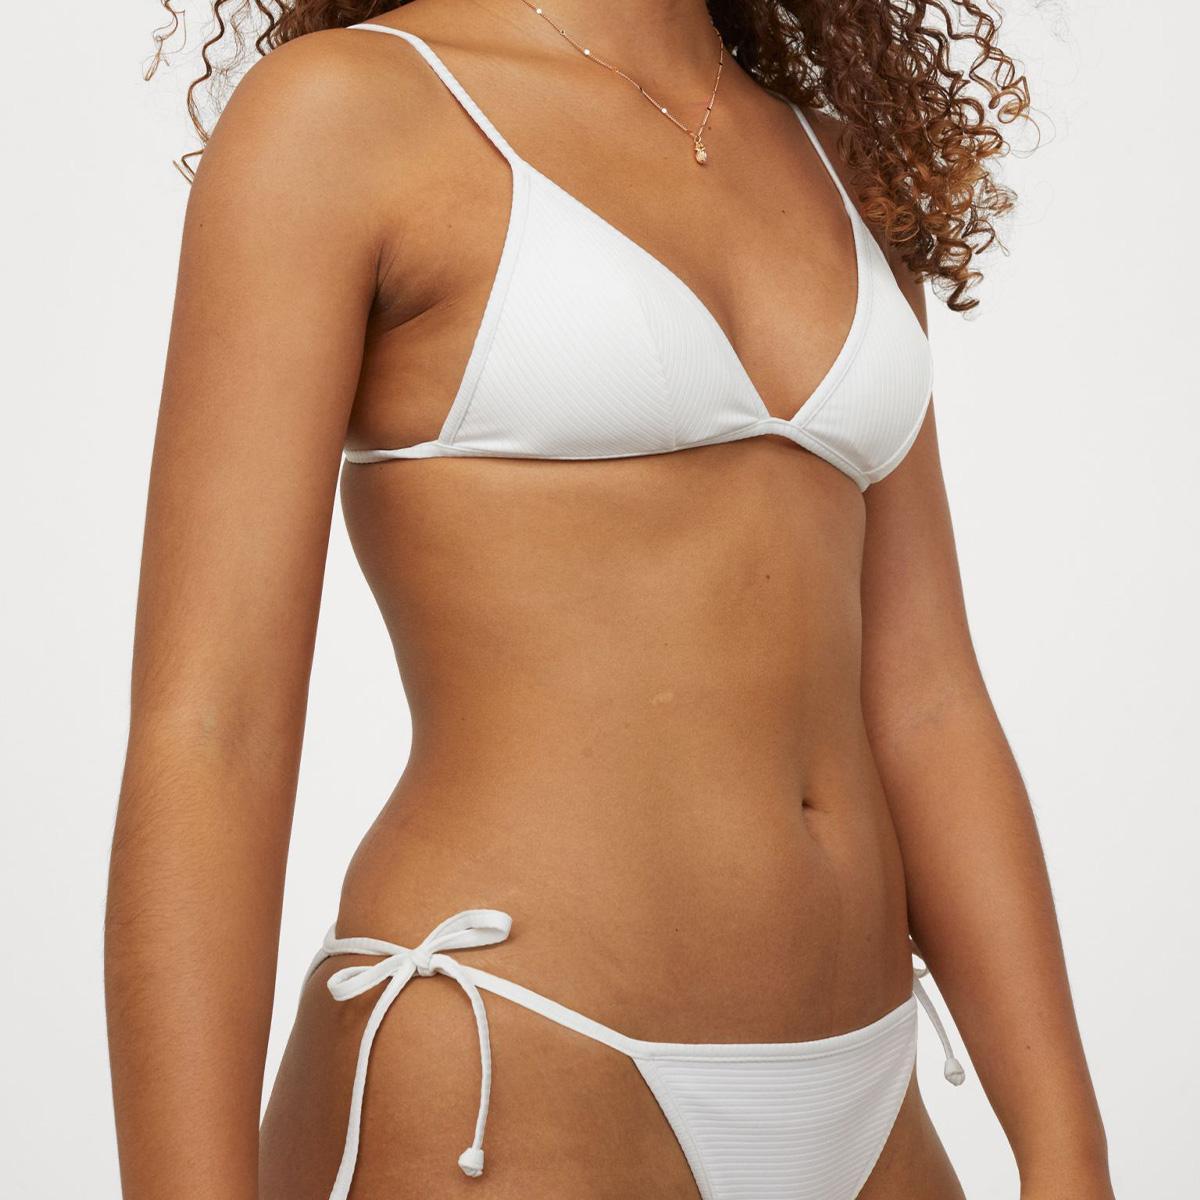 The Timeless Bikini Trend That's Classically Sexy - string bikini trend 294159 1625867105630